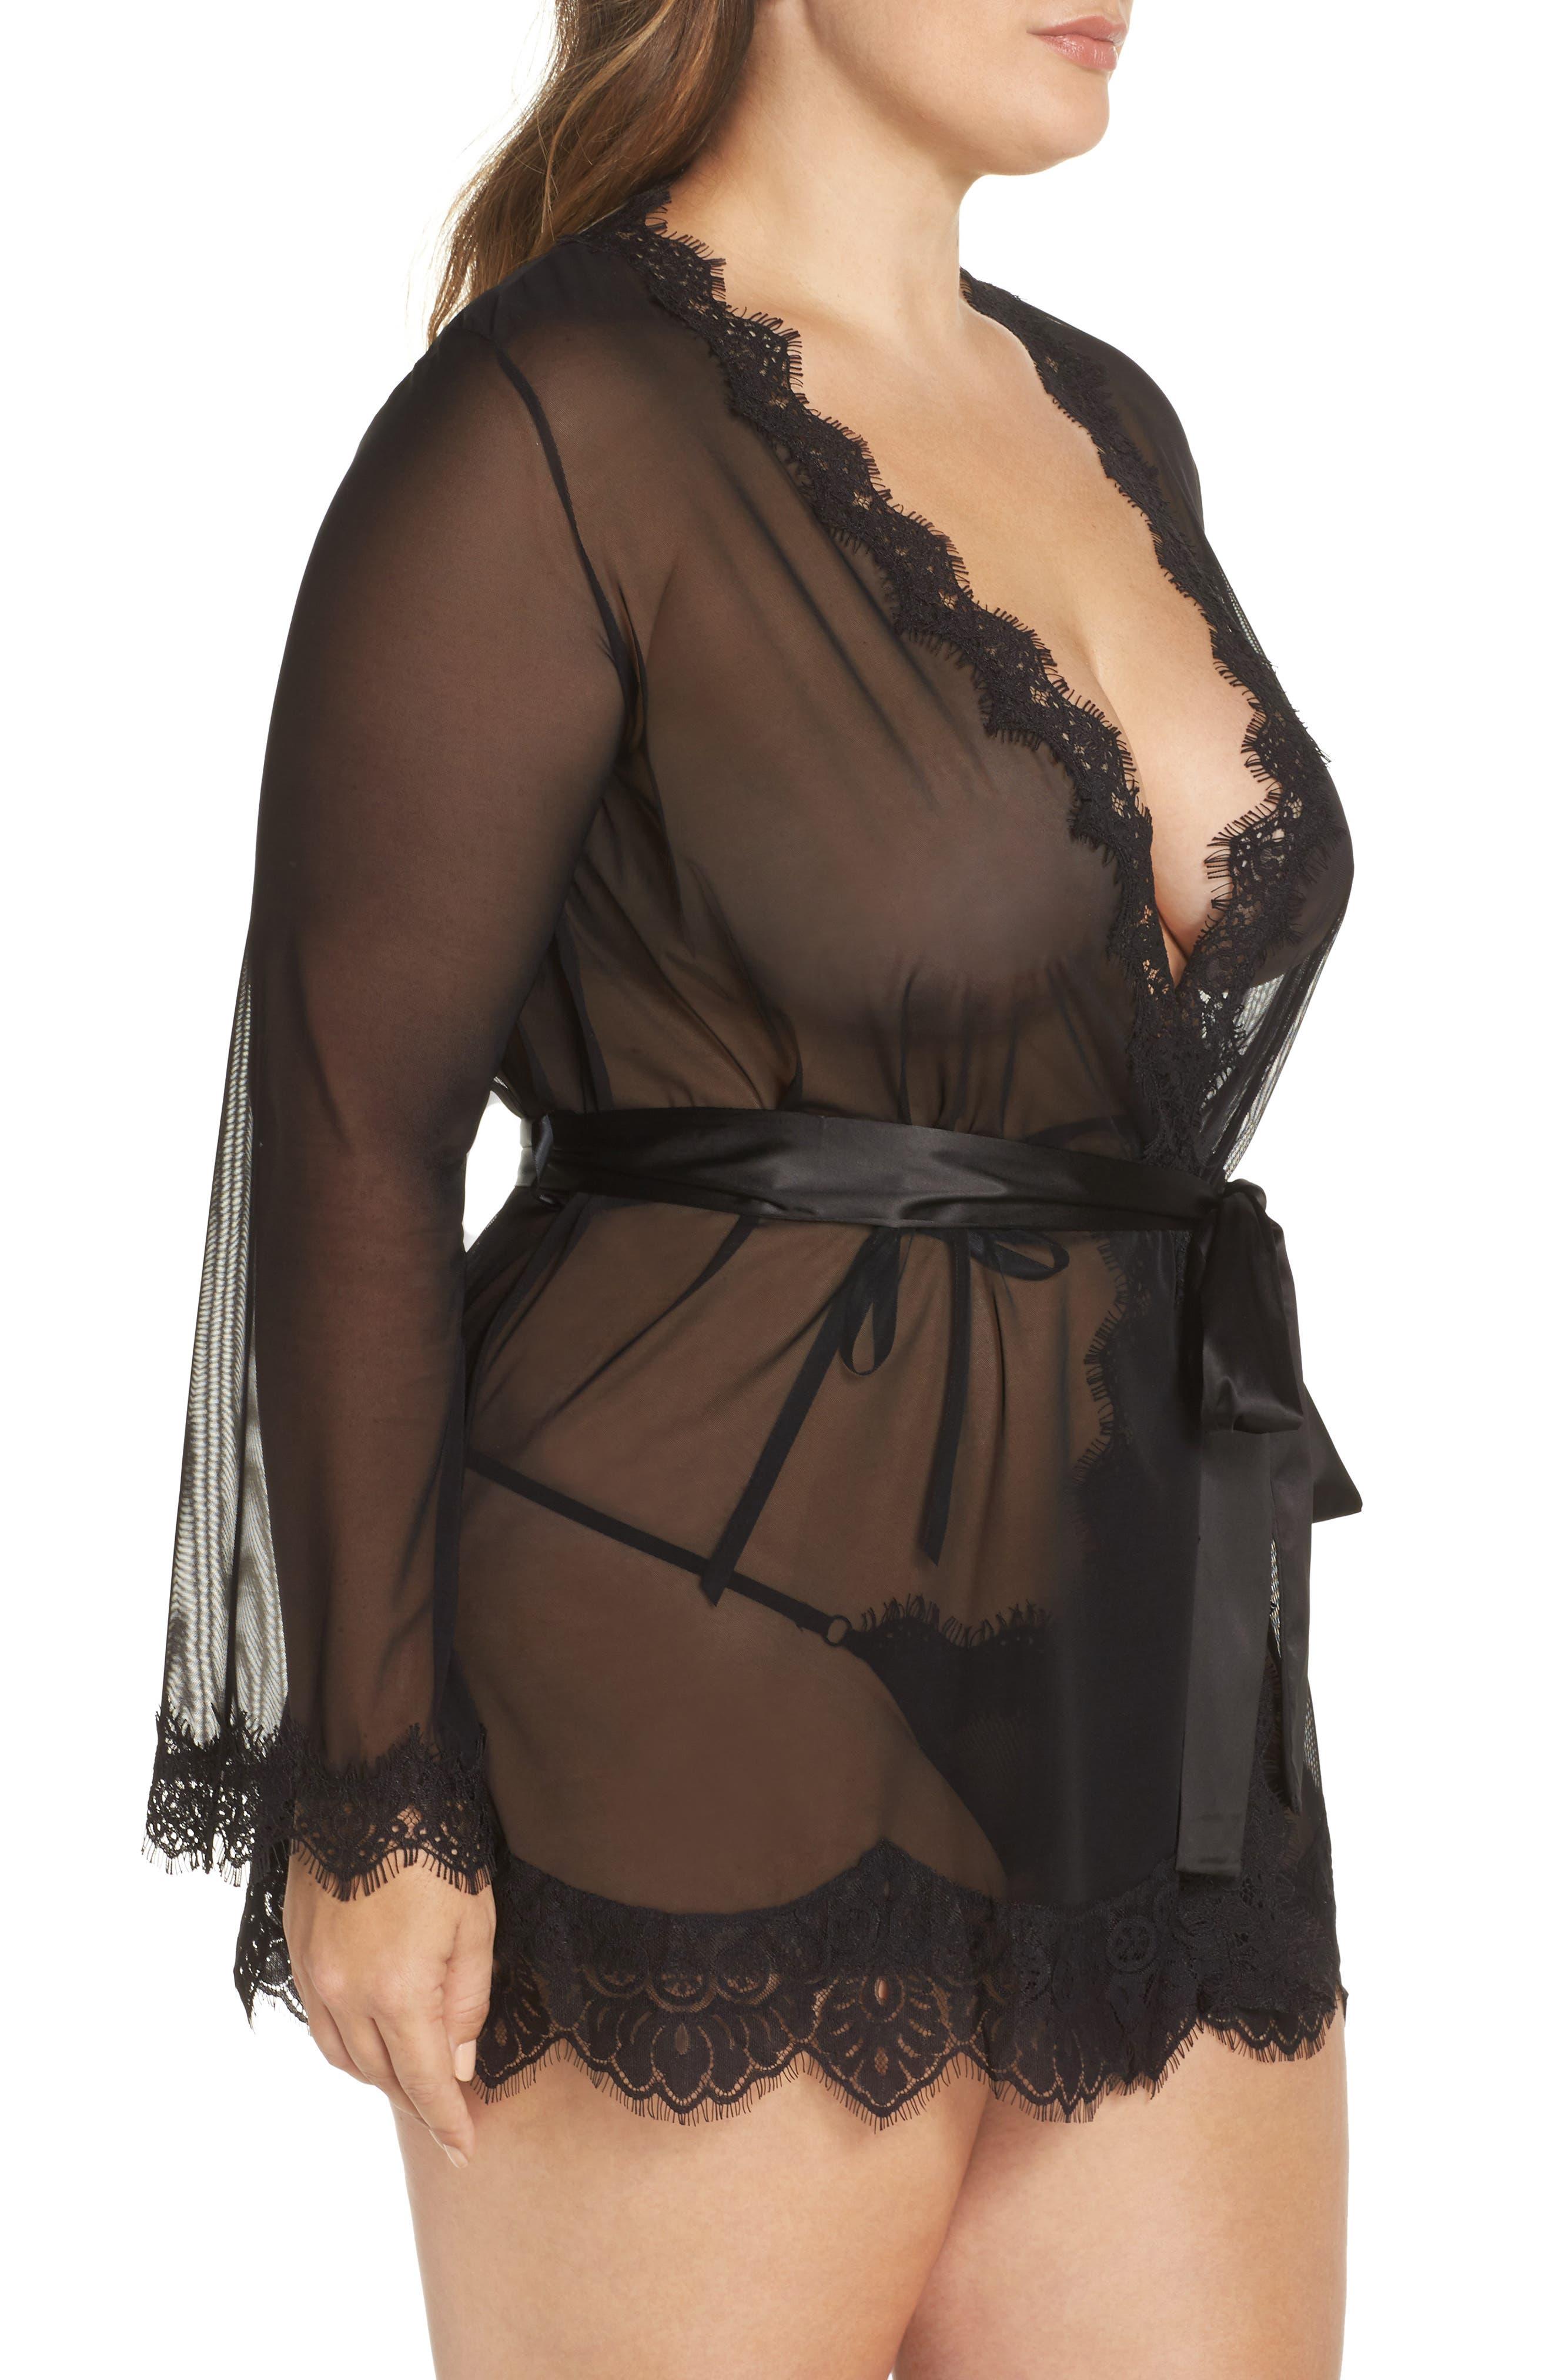 Alternate Image 3  - Oh La La Cheri Eyelash Curves Robe & G-String (Plus Size)